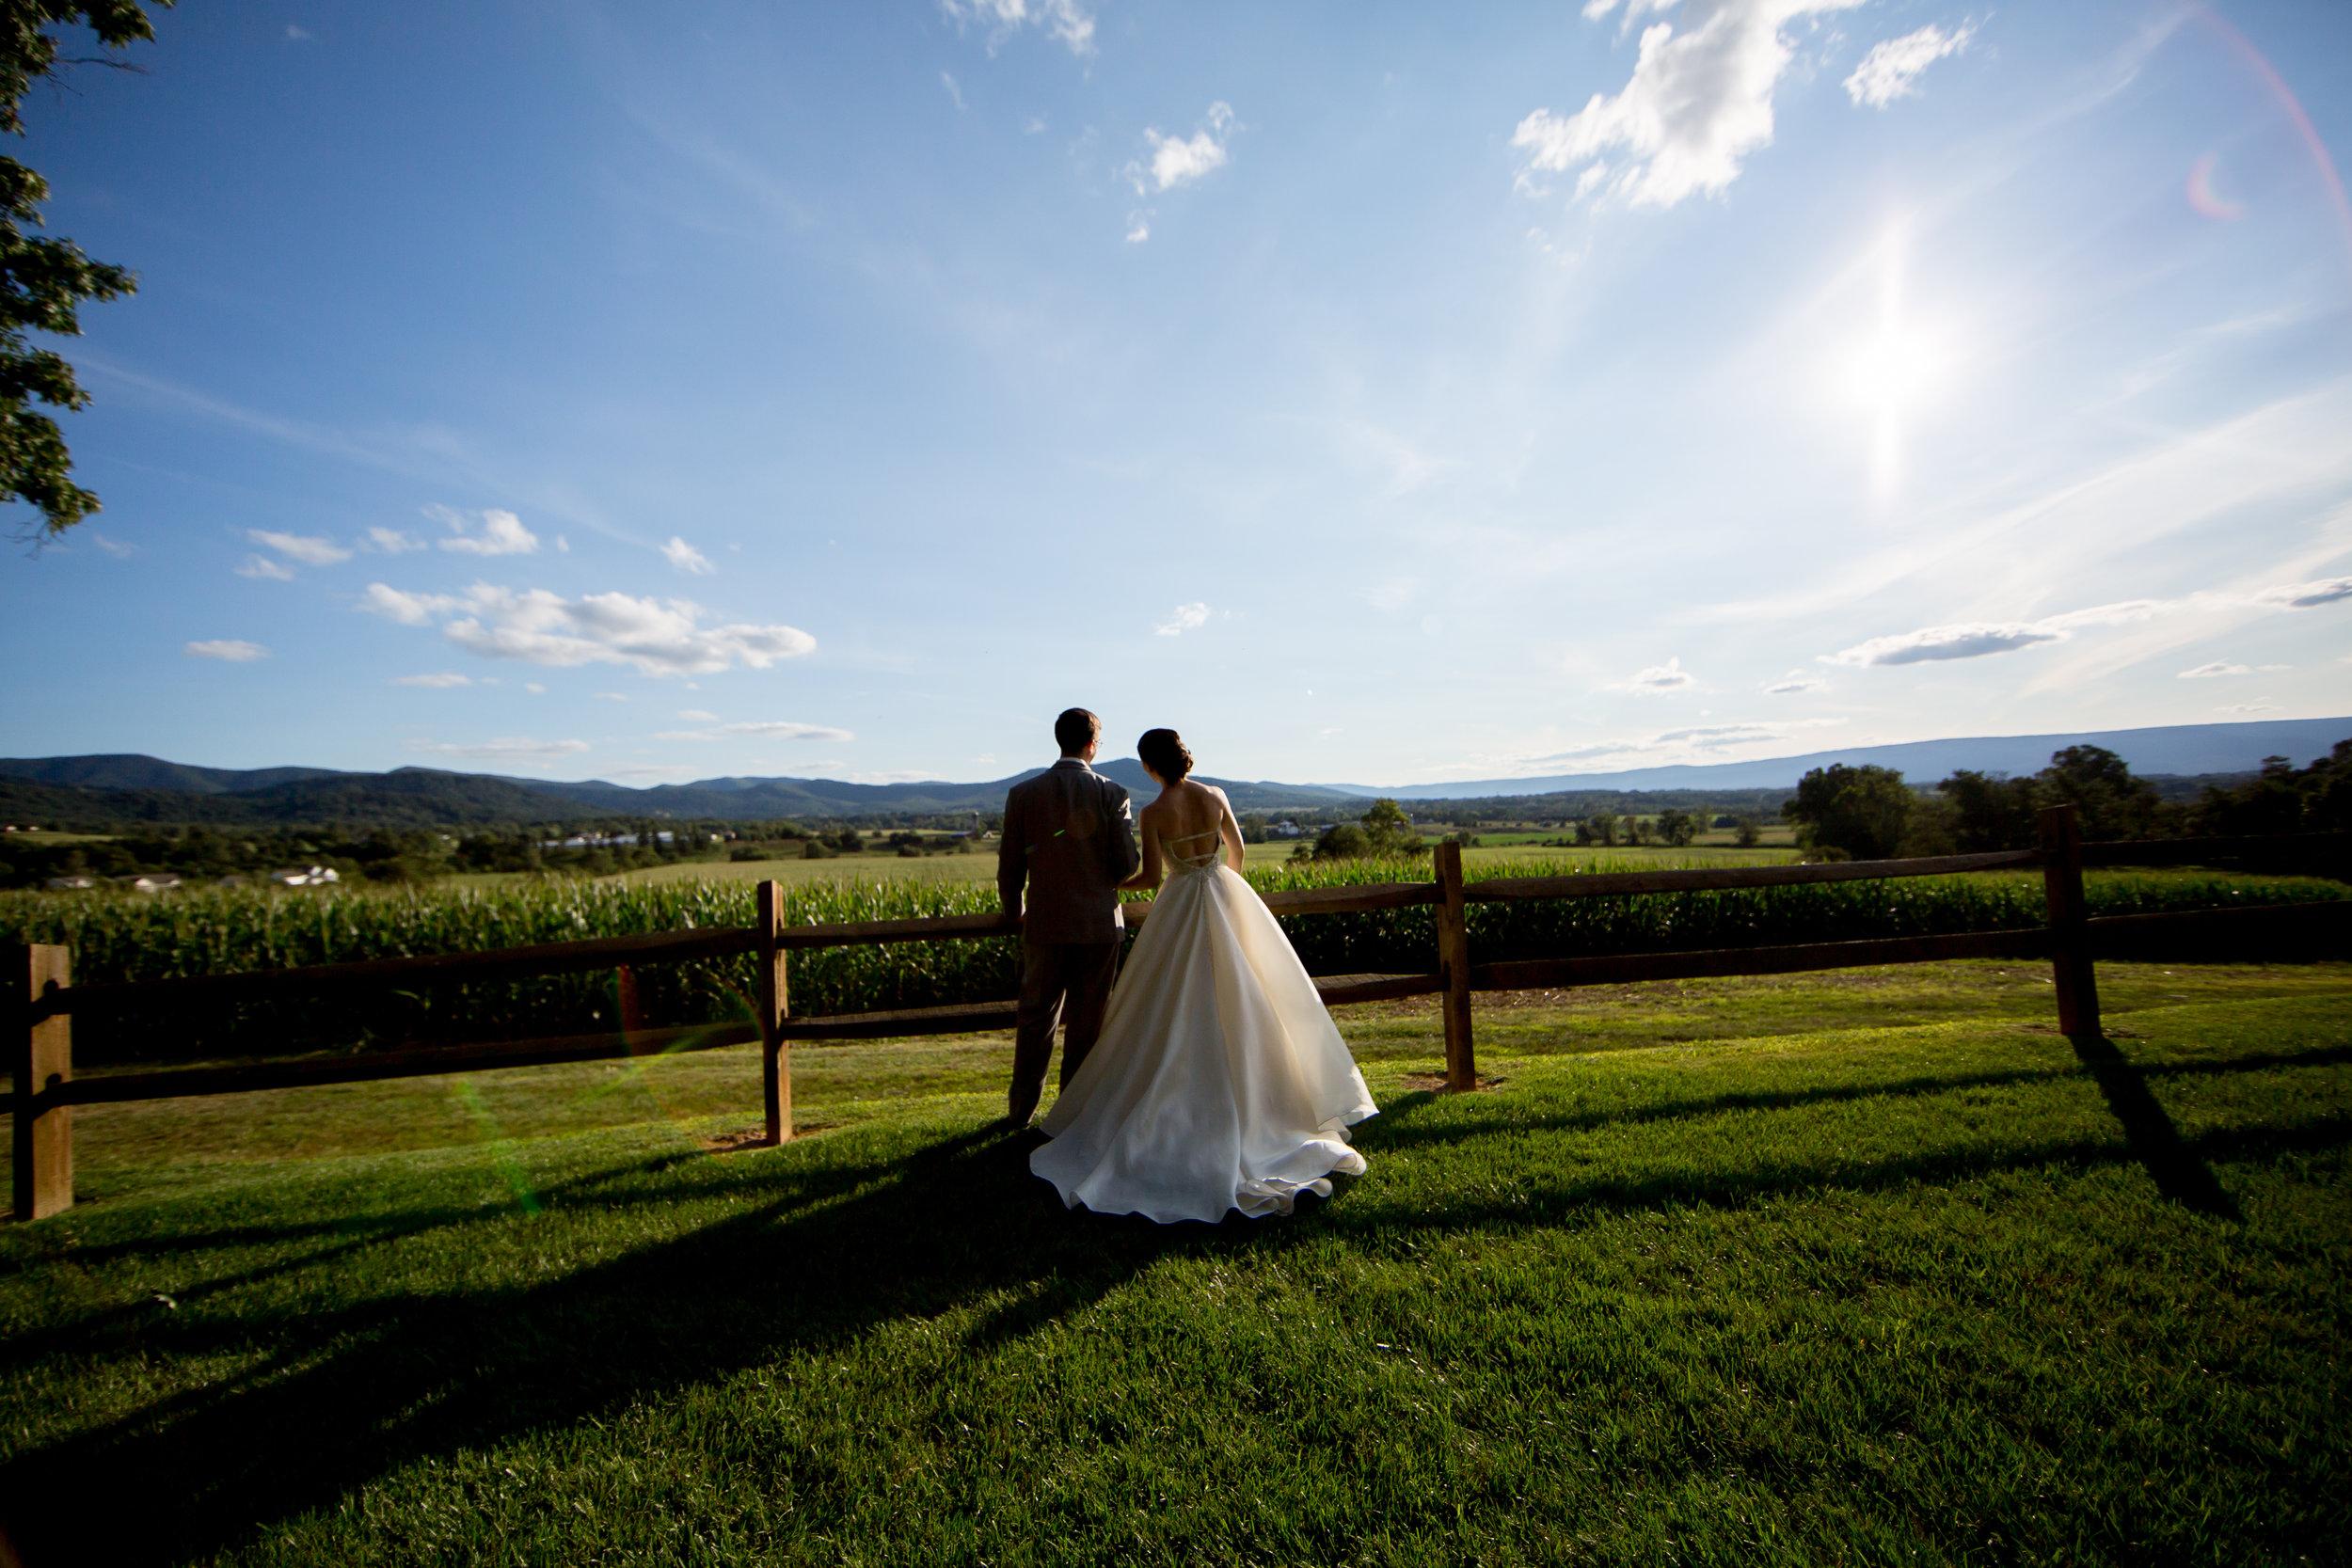 ca_080517_wedding_0494.jpg